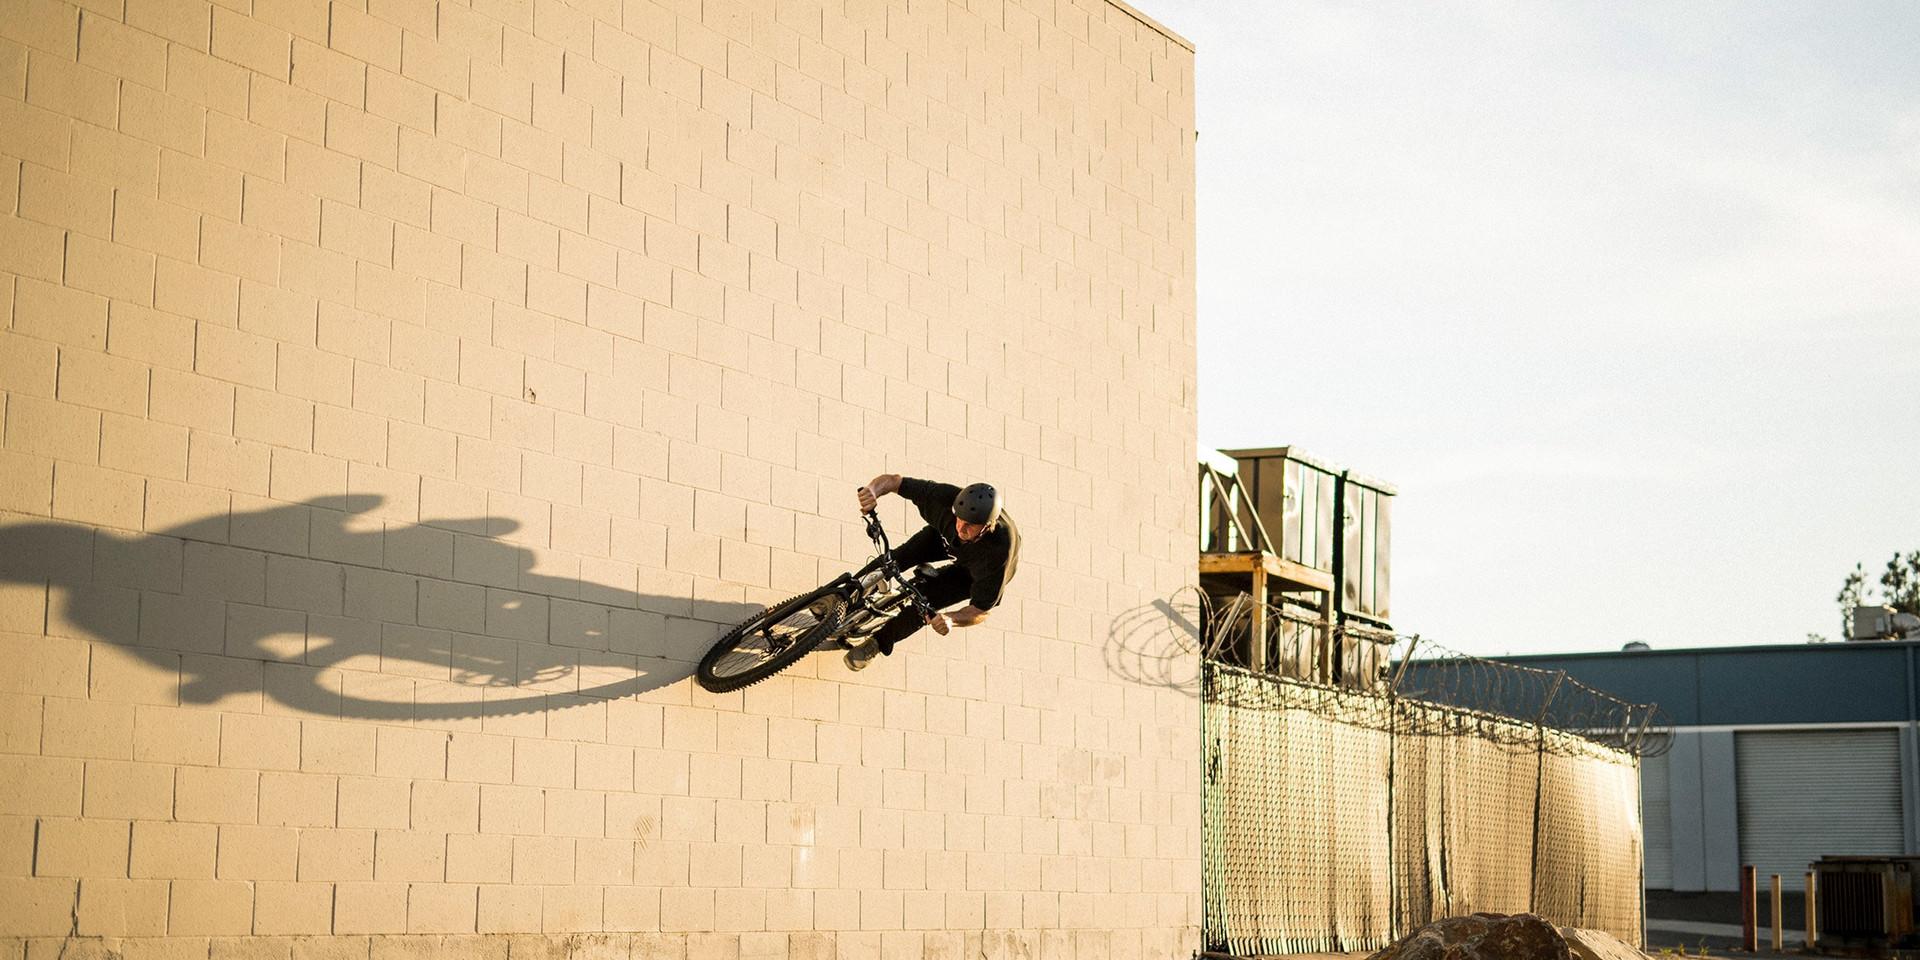 Ibis-Cycles-Ripmo-AF-Action-19-web.jpg